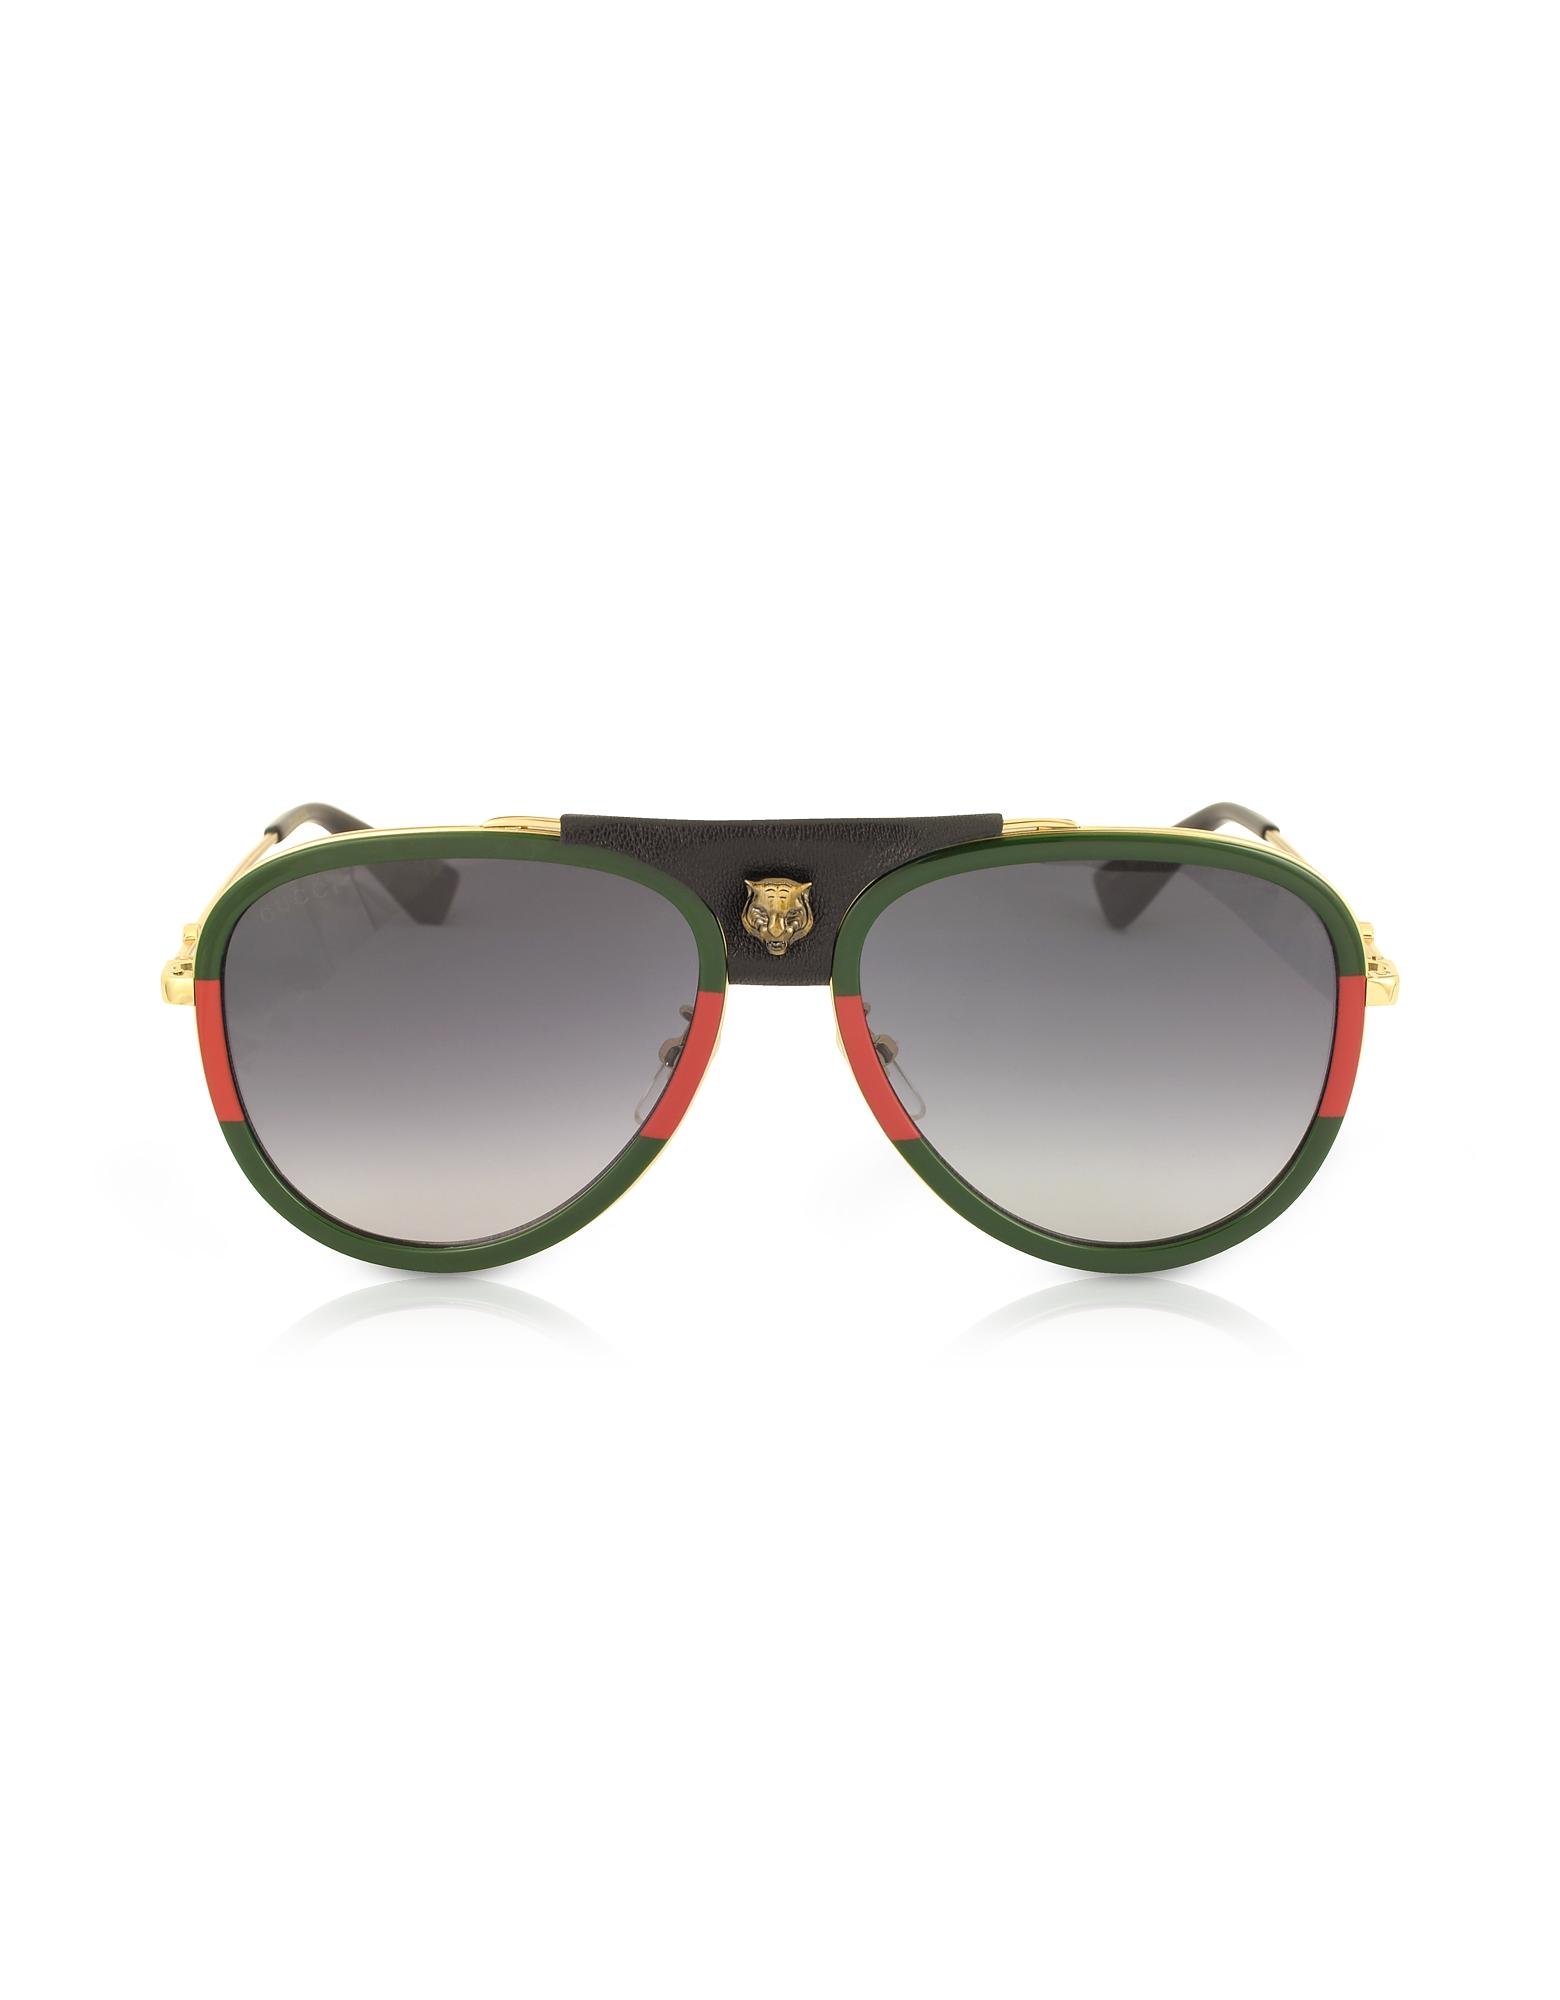 Gucci Designer Sunglasses, GG0062S Aviator Gold Metal and Black Leather Sunglasses